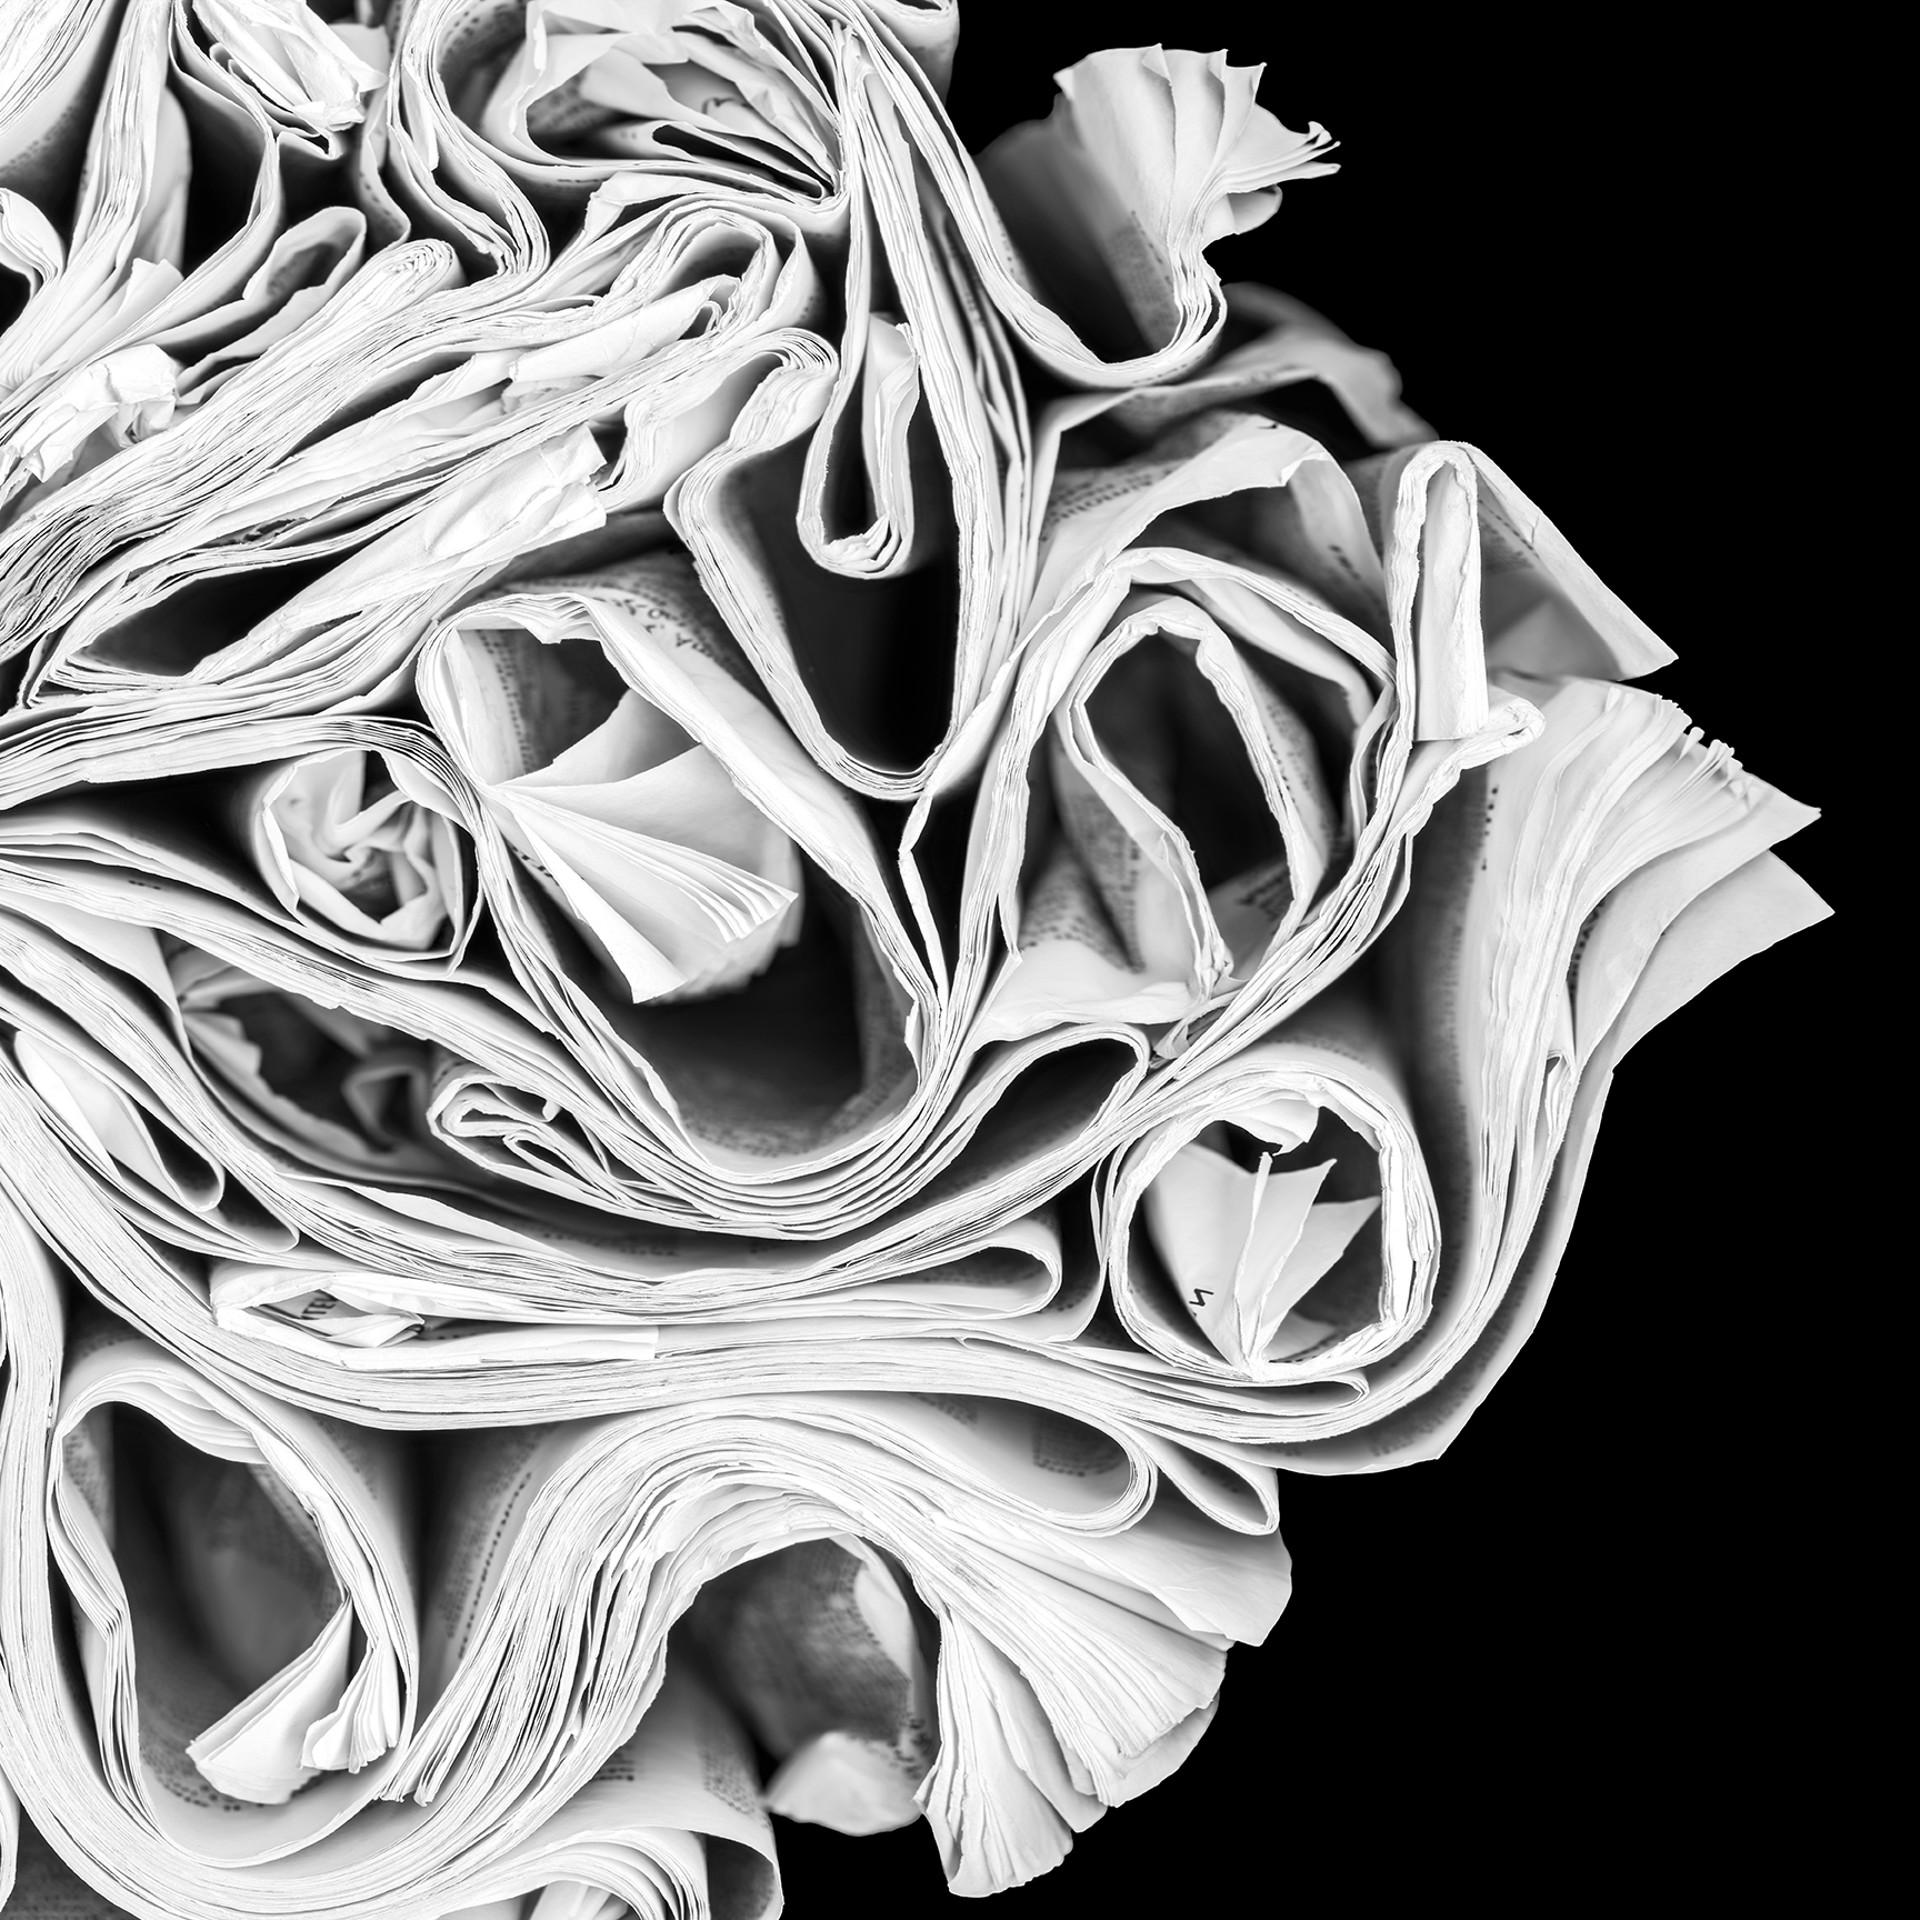 Waves by Cara Barer